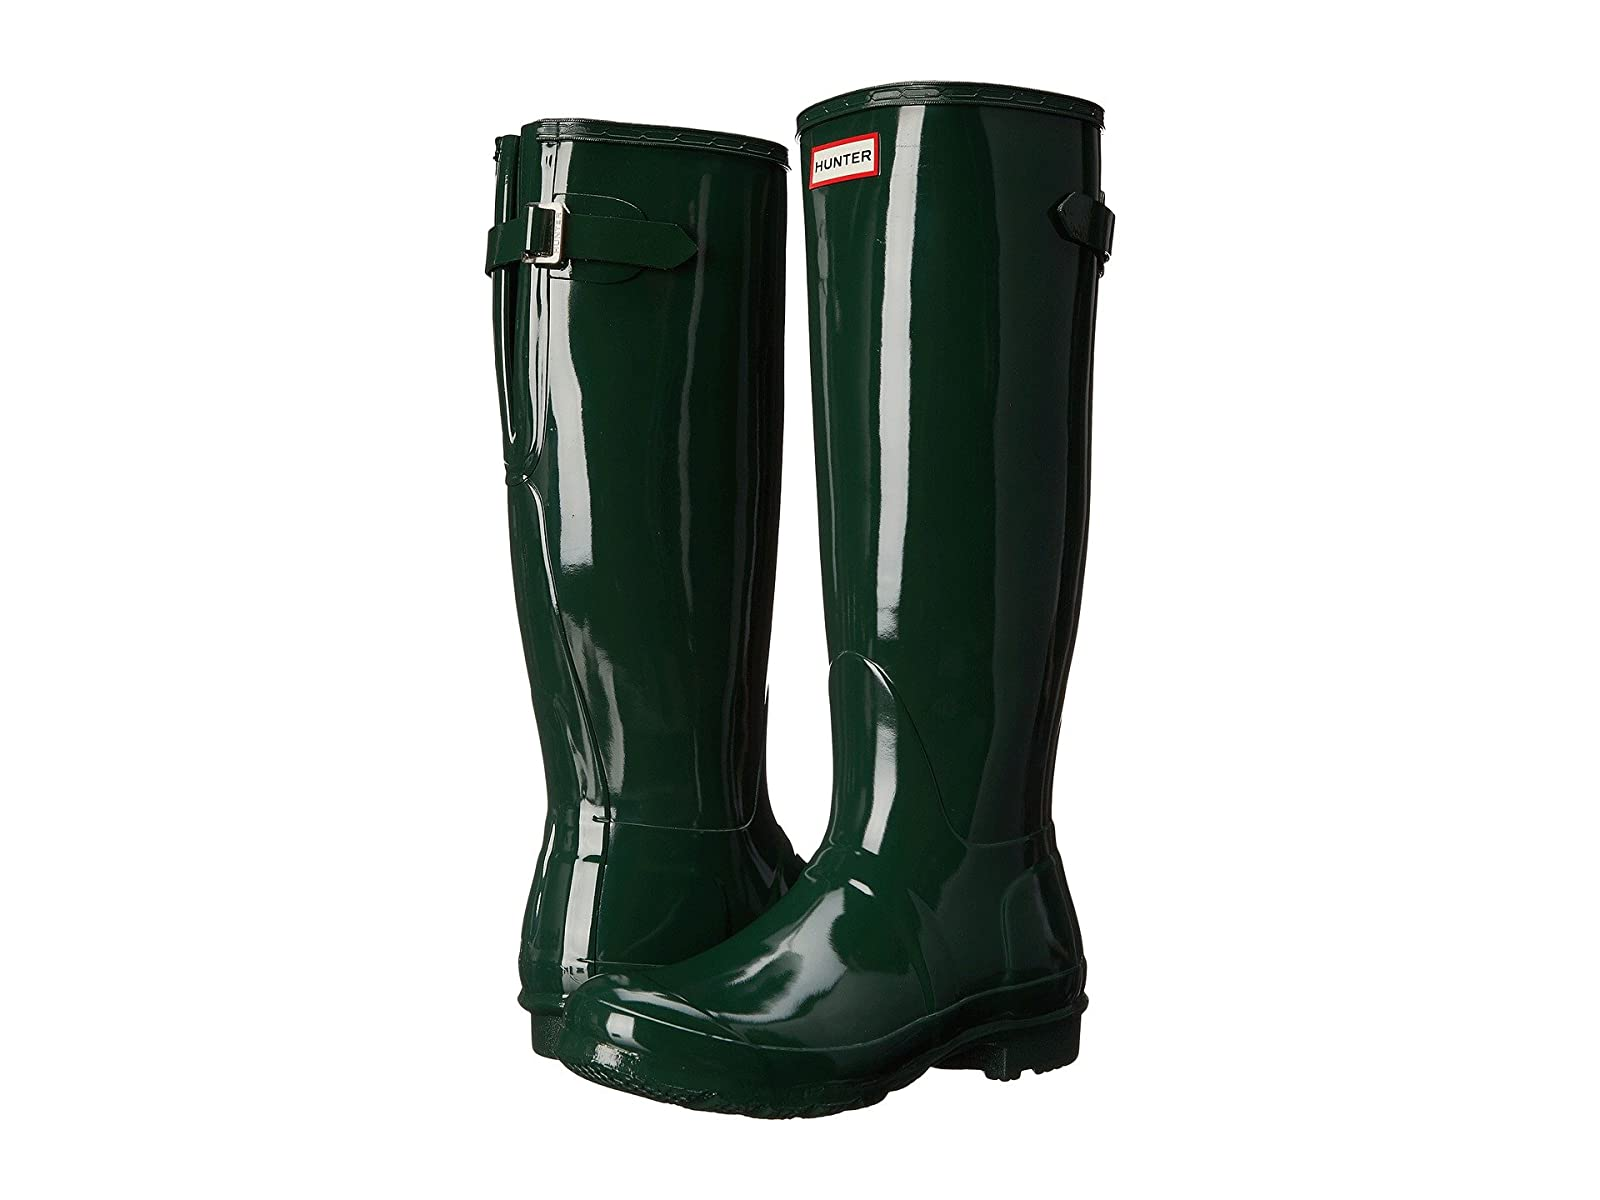 Hunter Original Back Adjustable Gloss Rain BootsAffordable and distinctive shoes